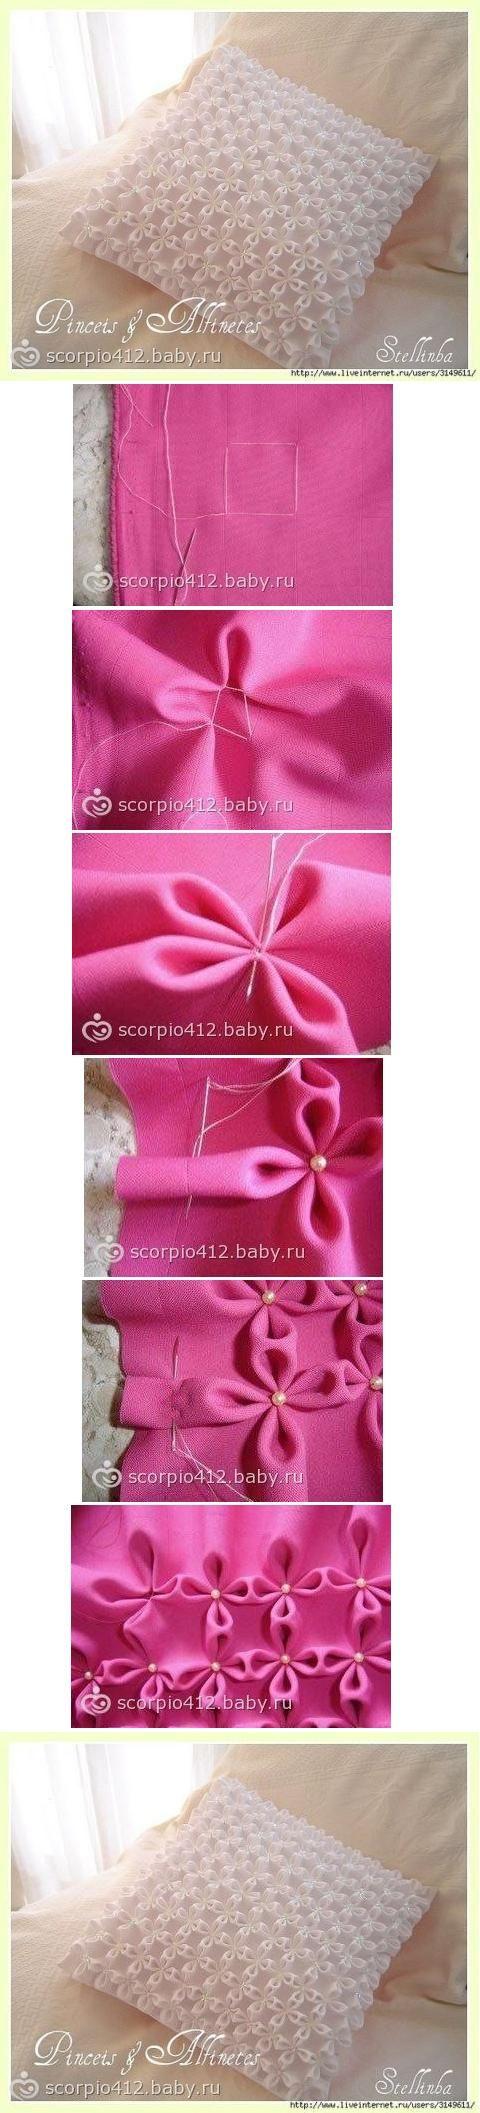 cojin-con-flores-en-relieve.jpg 480×2,113 píxeles